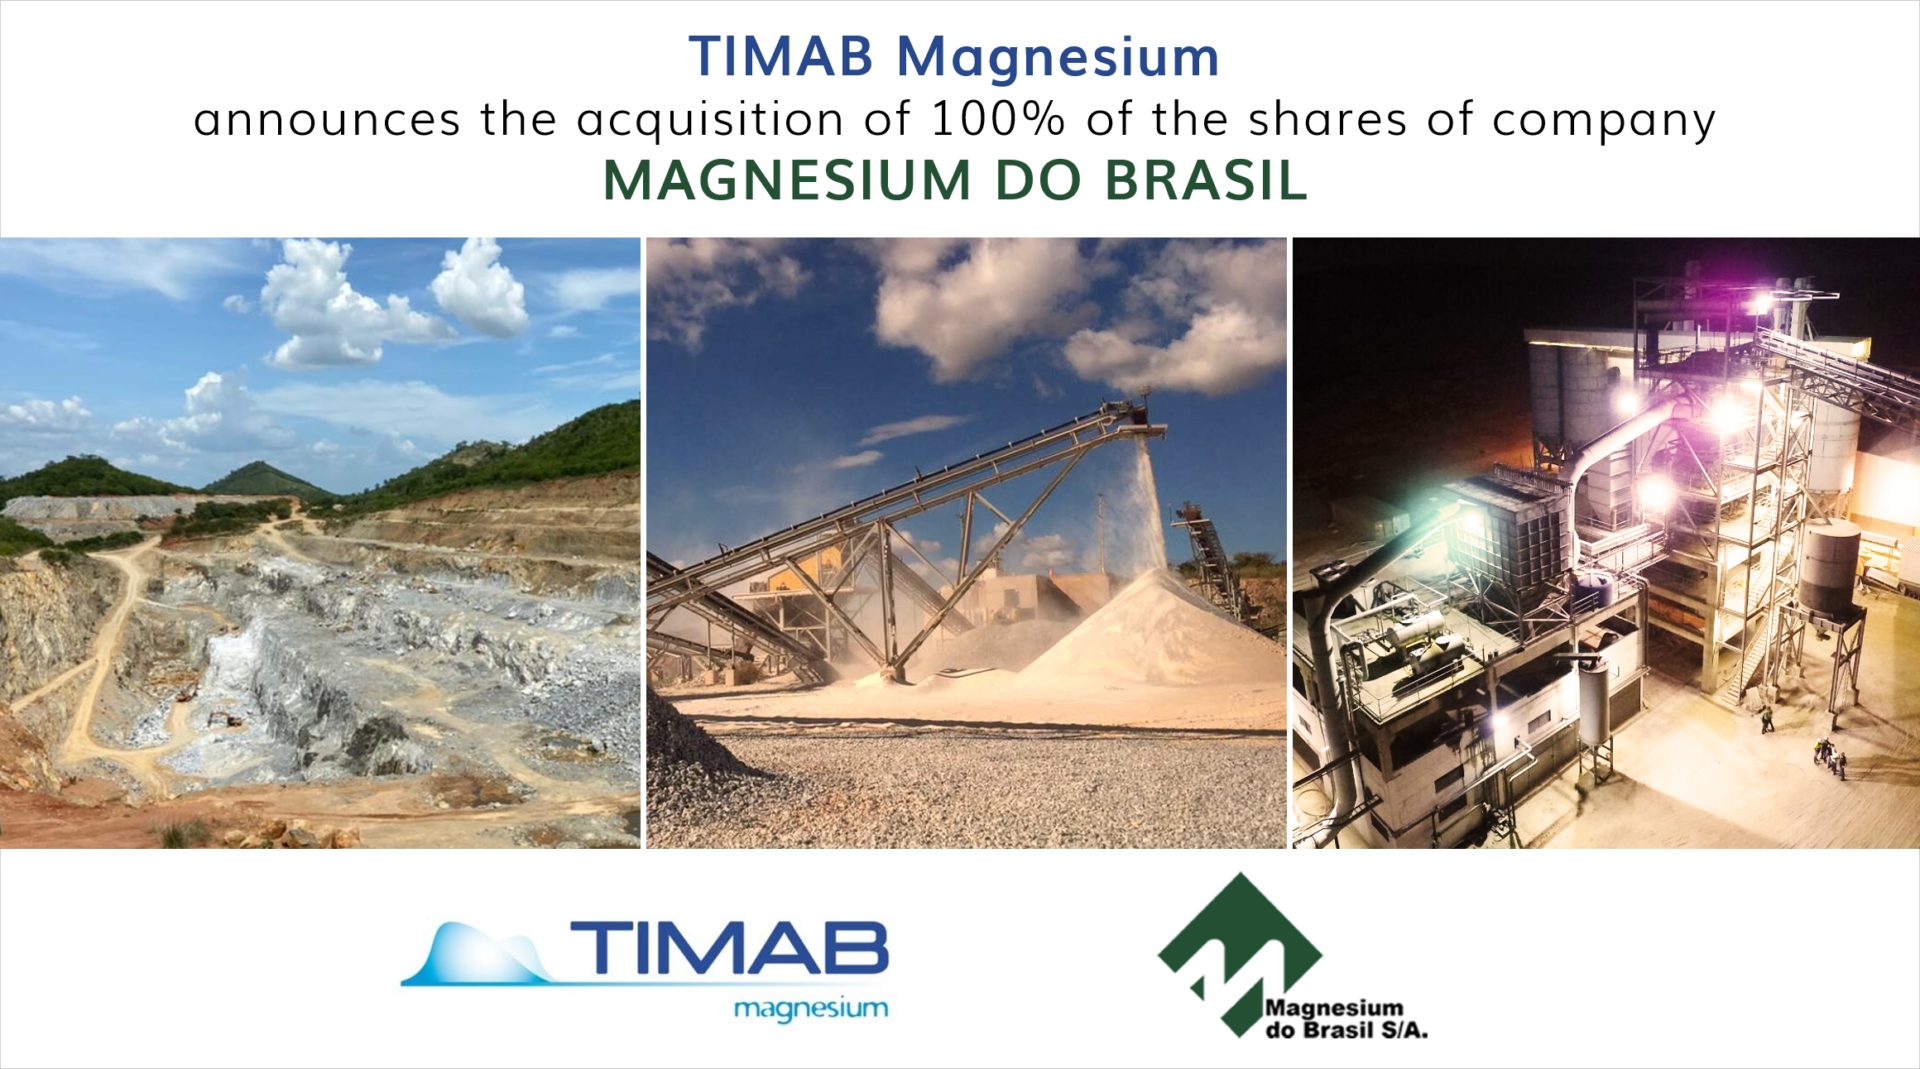 TIMAB MAGNESIUM ANNOUNCES ITS ACQUISITION OF MAGNESIUM DO BRASIL. 